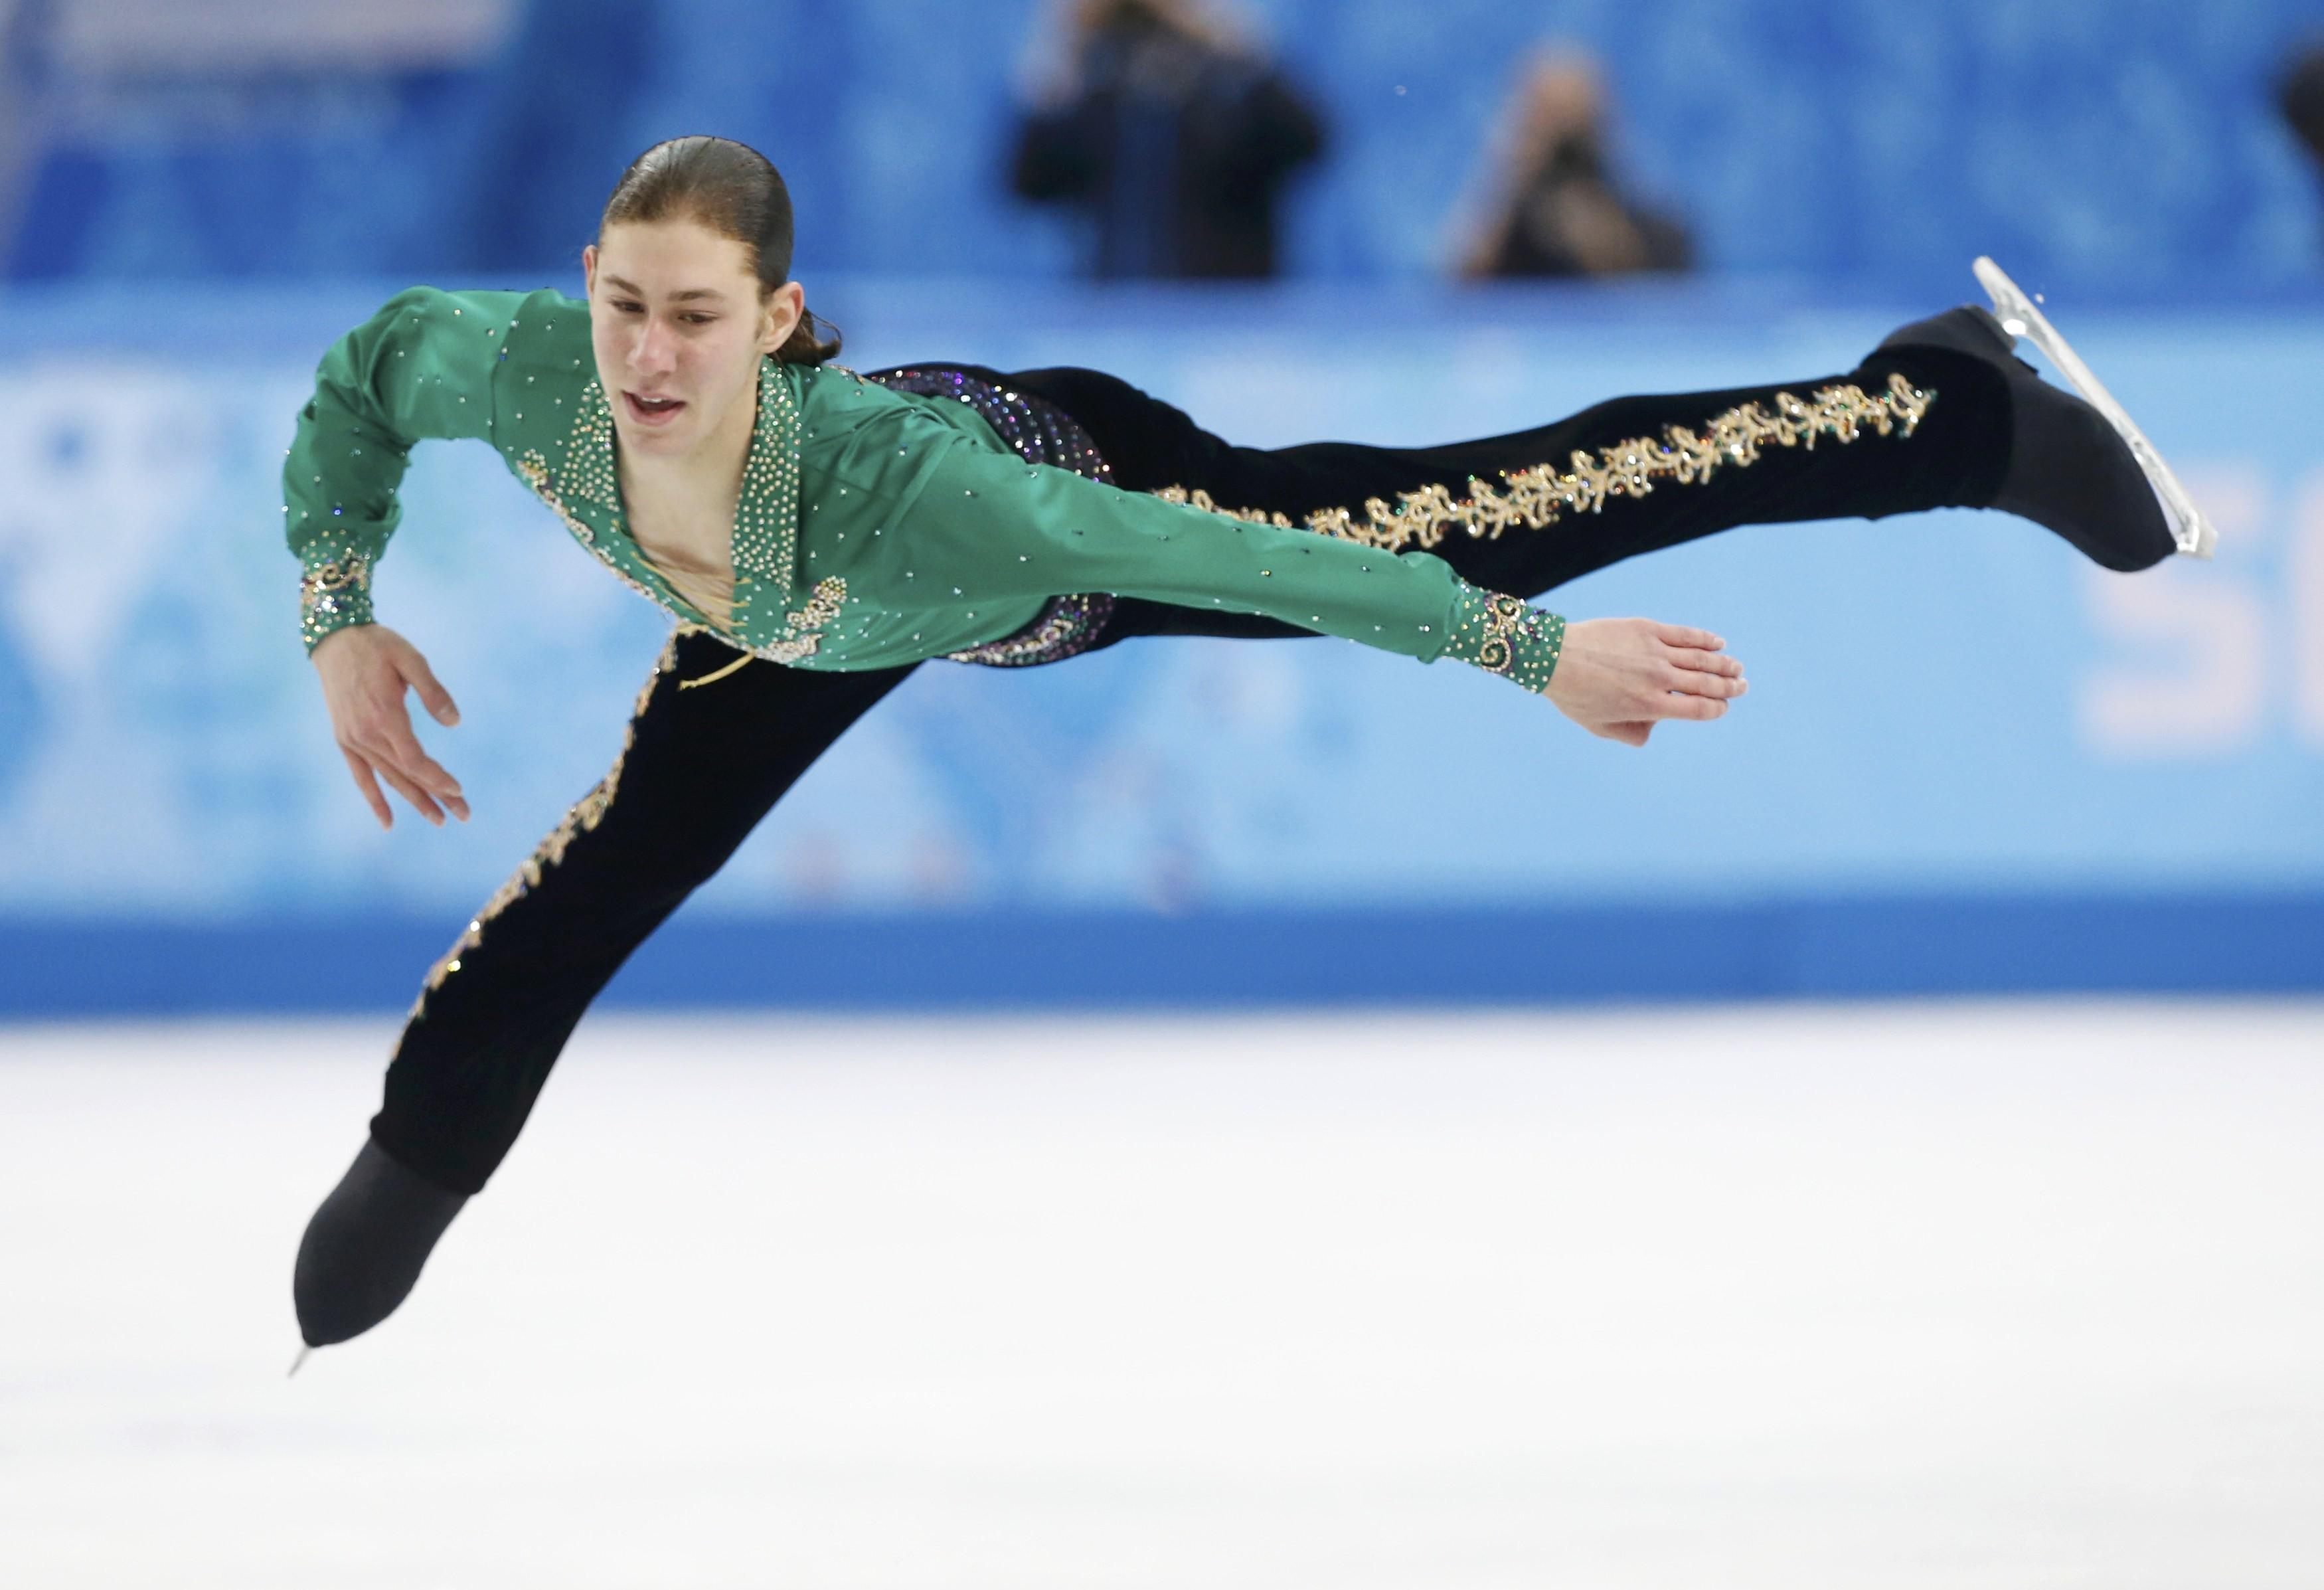 Джейсон Браун / Jason BROWN USA _Jason_Brown_American_bronze_medalist_skater_069454_